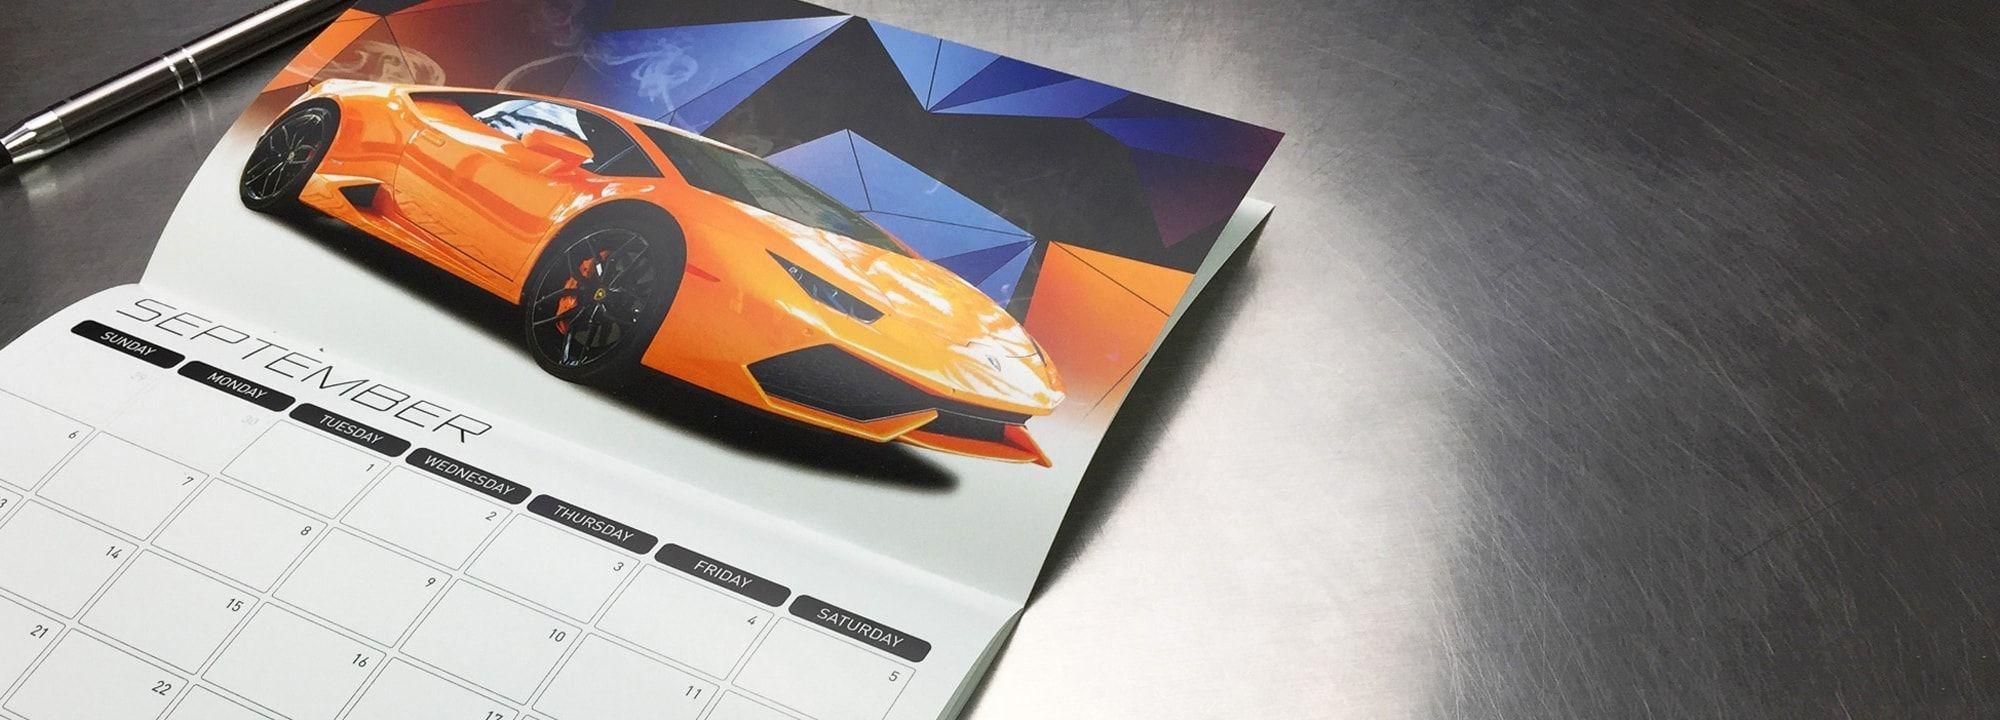 "Custom 5.5 X 8.5"" Wall Calendar Printing - Professional"